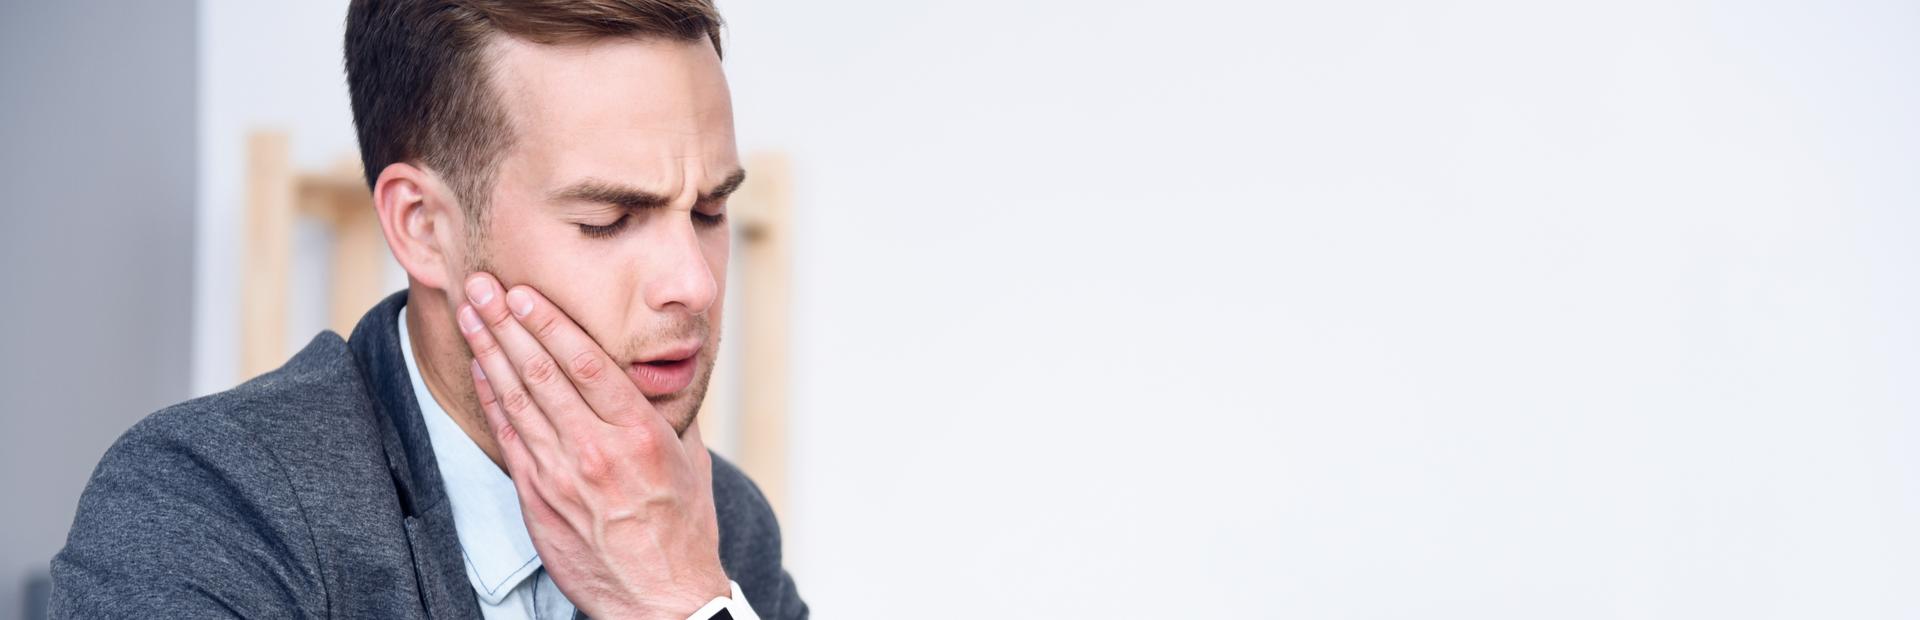 terapia skroniowo-żuchwowa – slider